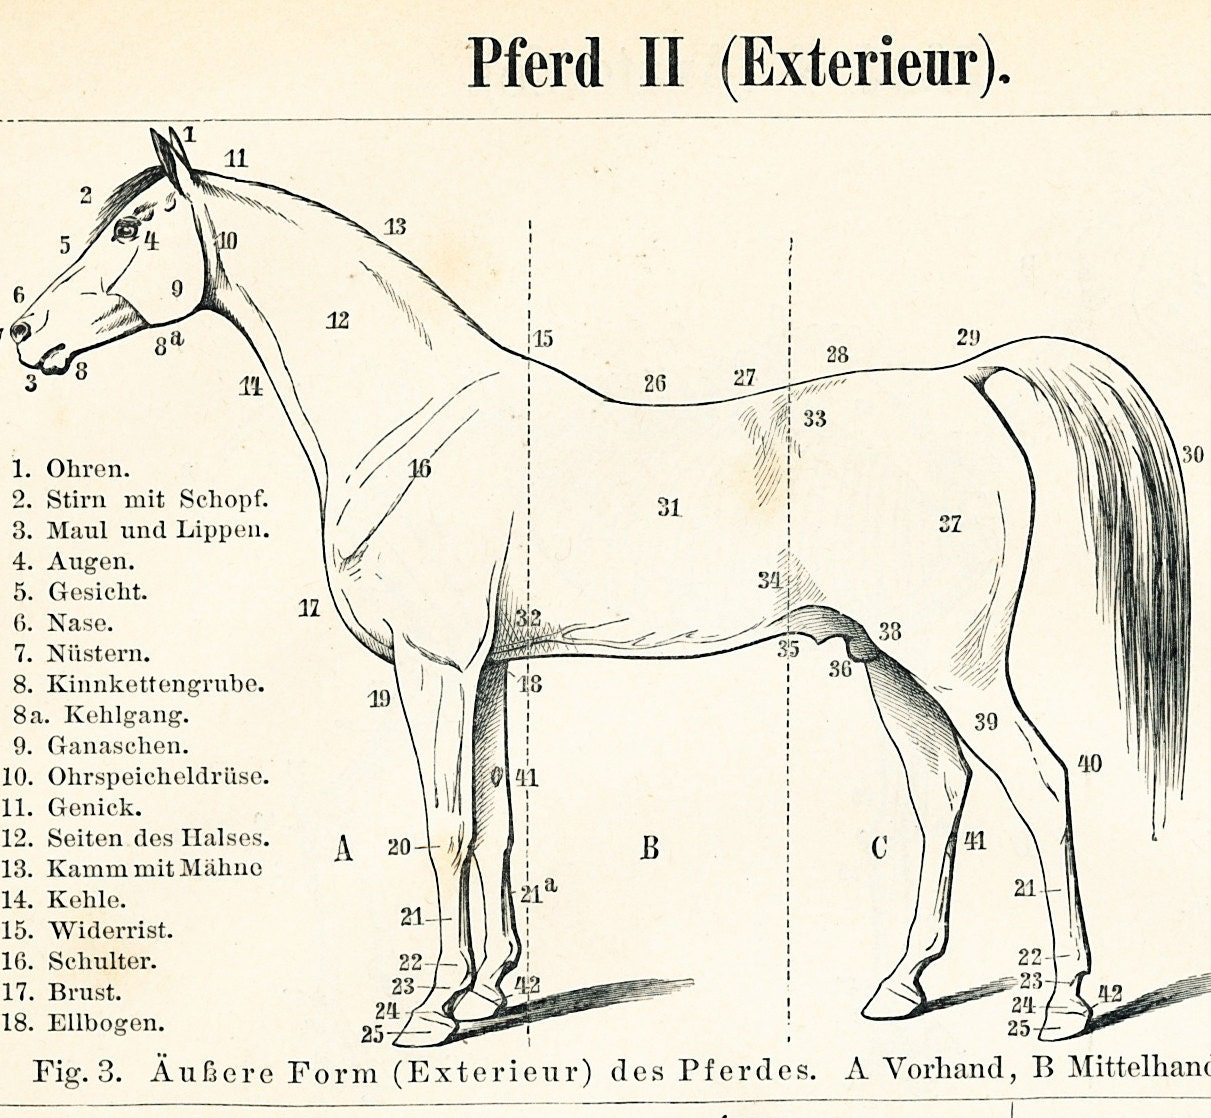 pferd anatomie druck pferd skelett druck pferd muskel system. Black Bedroom Furniture Sets. Home Design Ideas